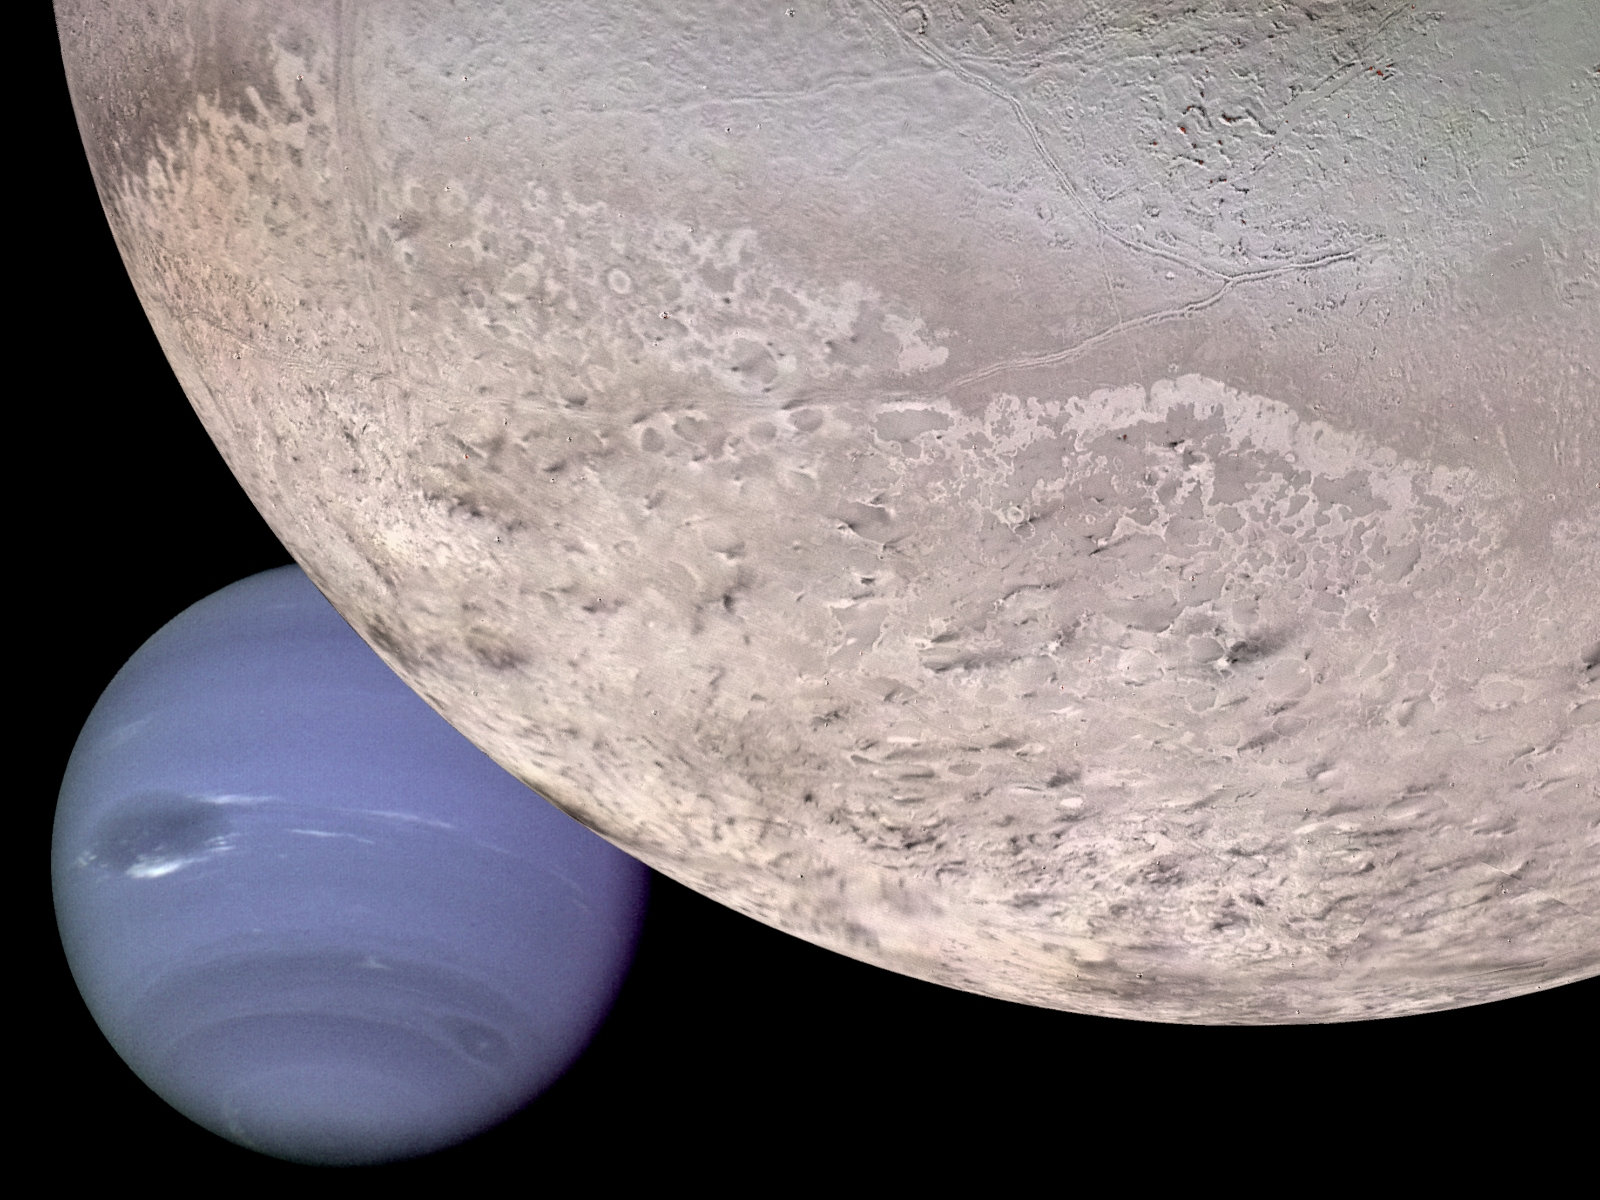 Montage: Neptune and Triton